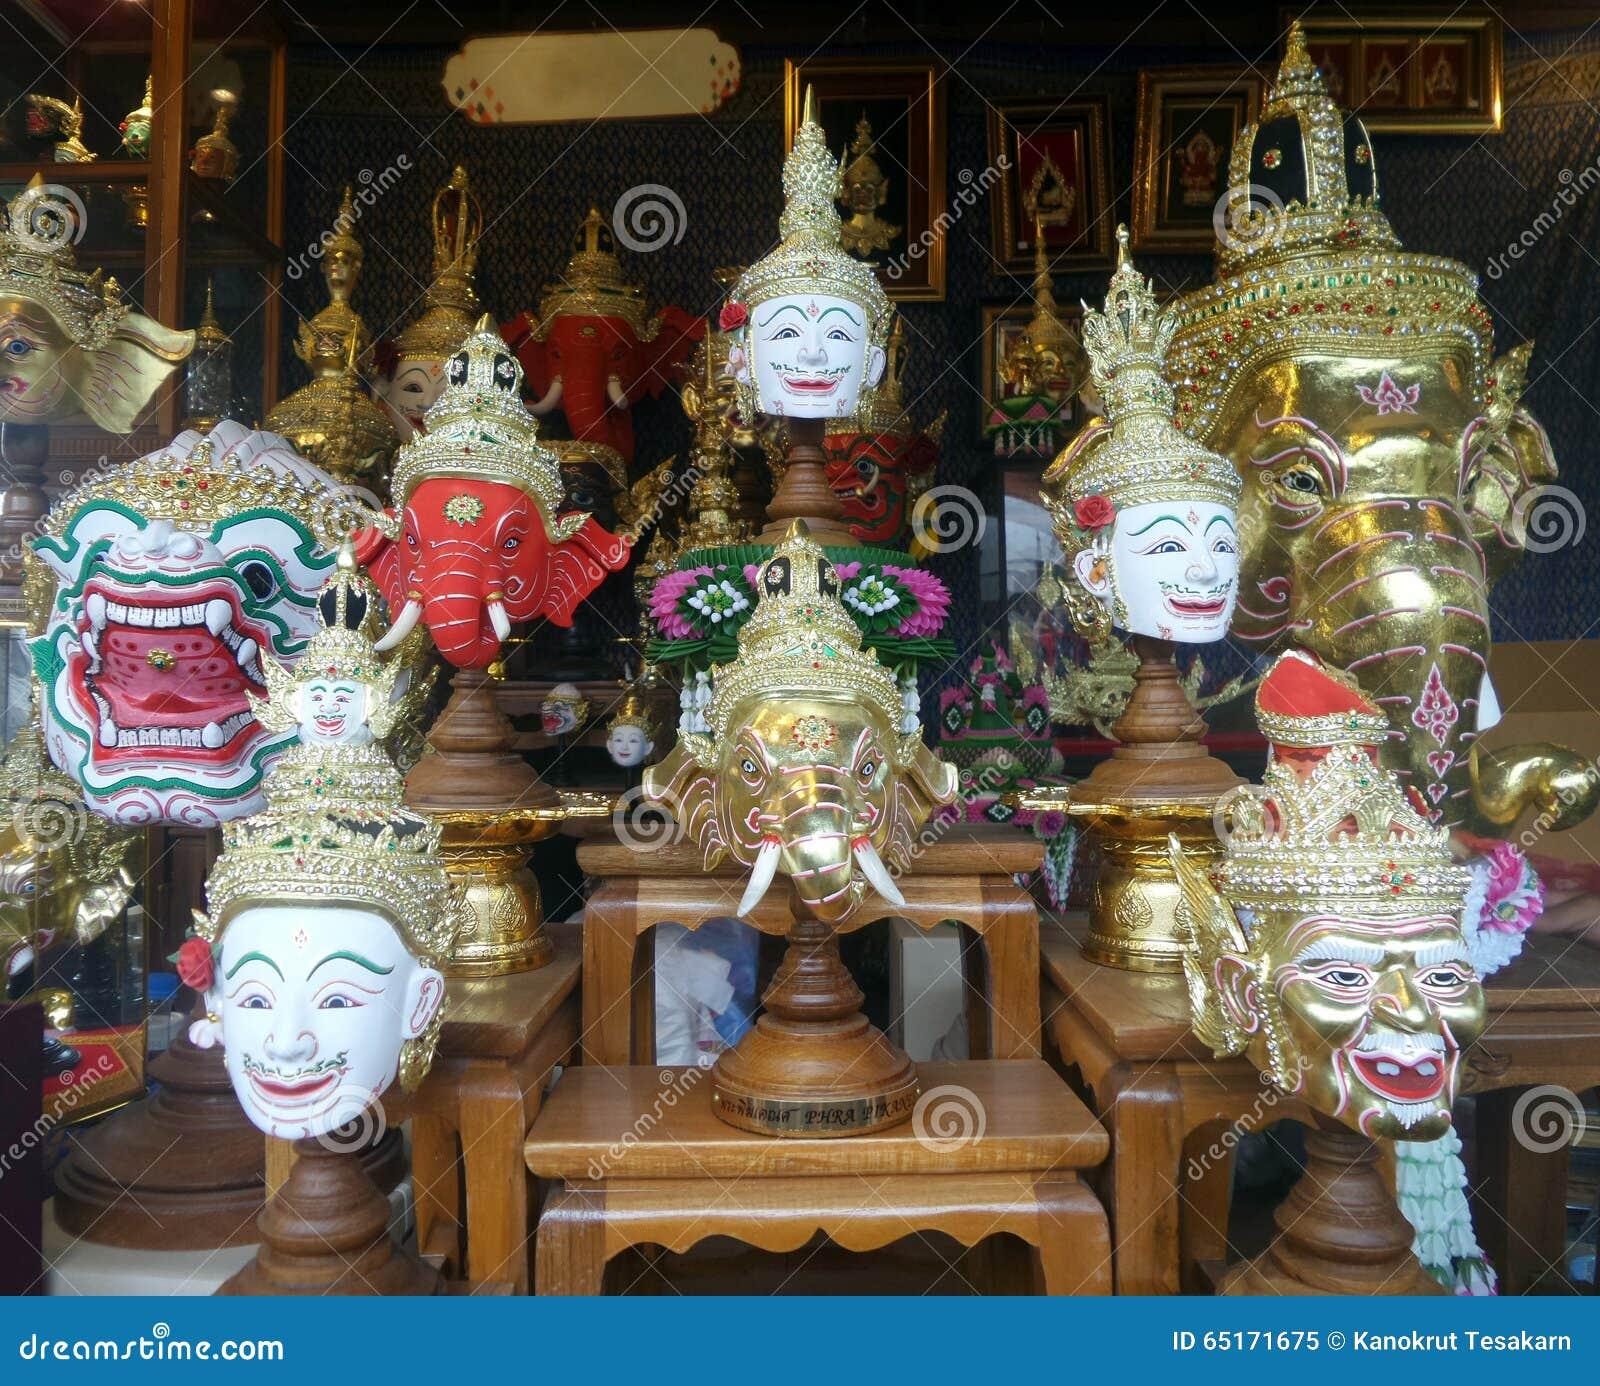 Khon actor mask stock image  Image of masked, fibre, dance